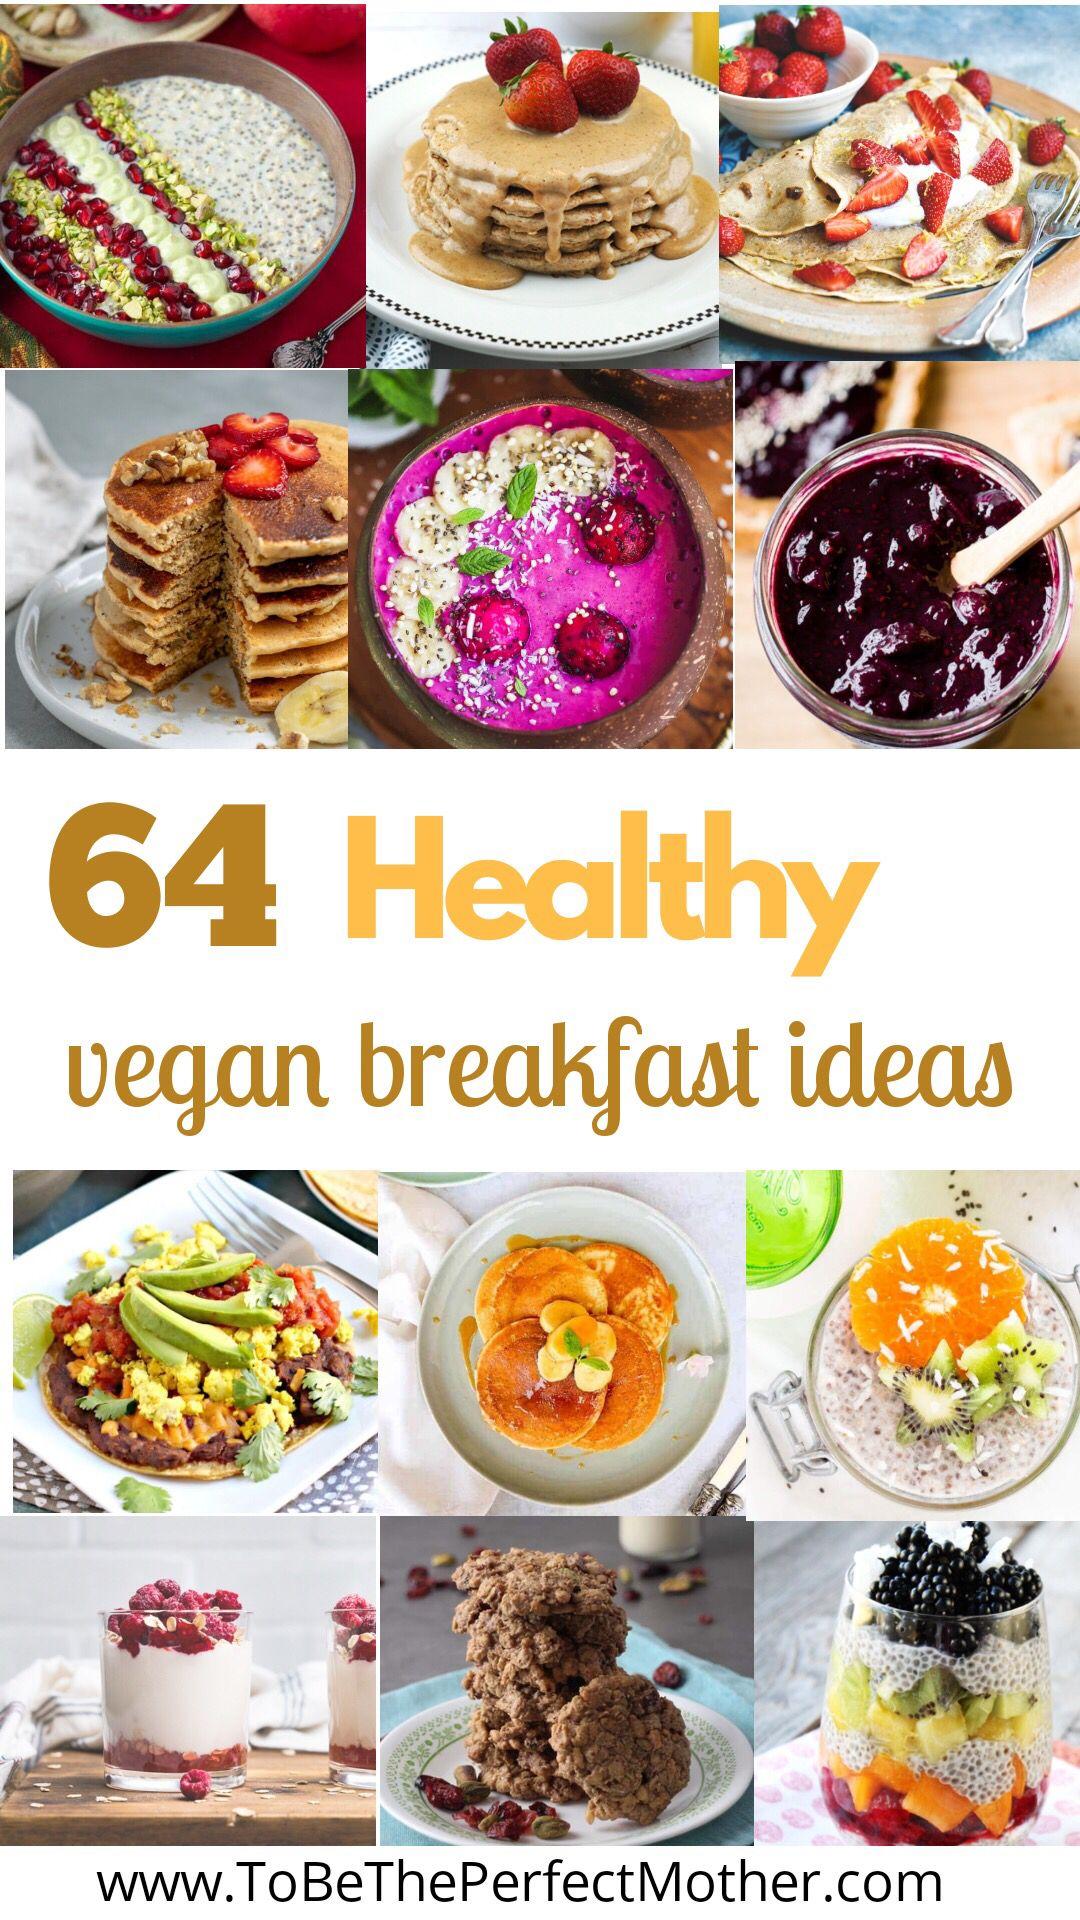 64 Vegan Breakfast Recipe Ideas To Be The Perfect Mother Vegan Breakfast Recipes Breakfast Cookies Healthy Vegan Breakfast Options